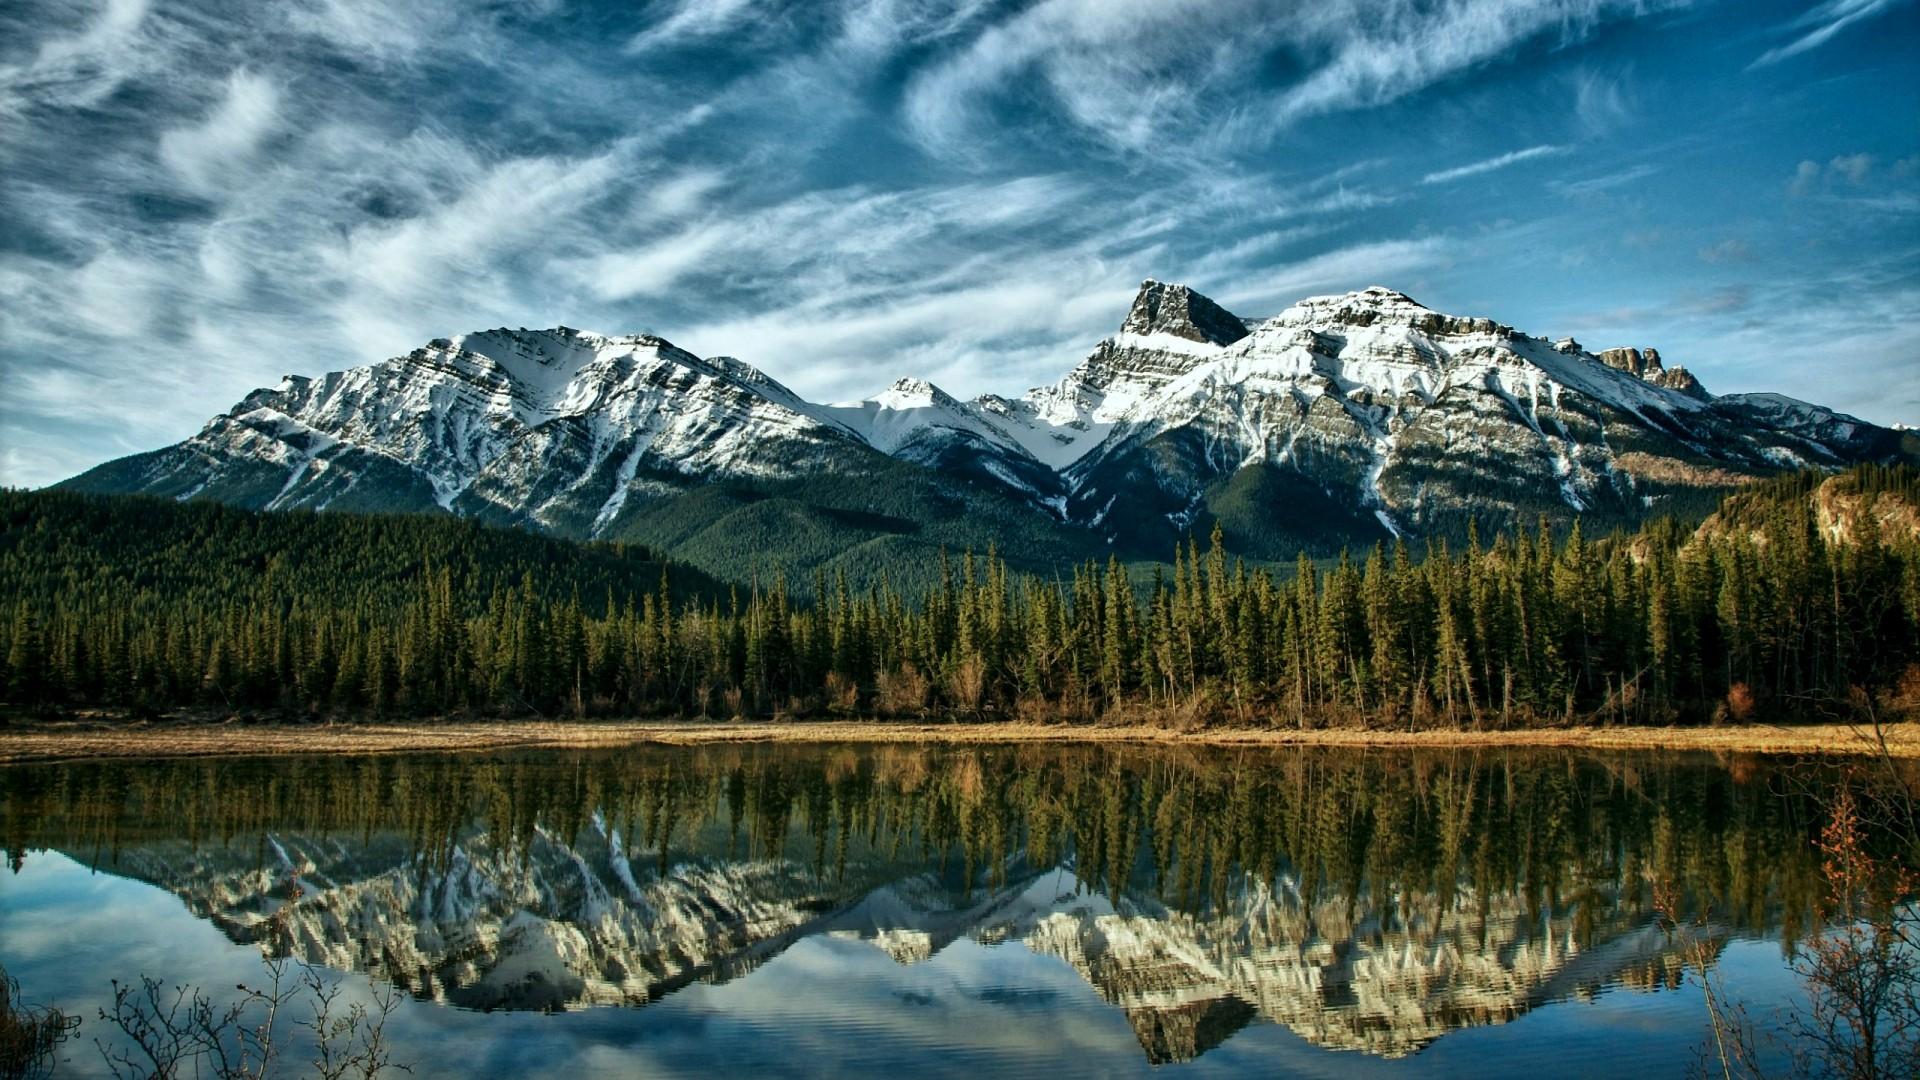 Amazing Mountain Range Wallpaper